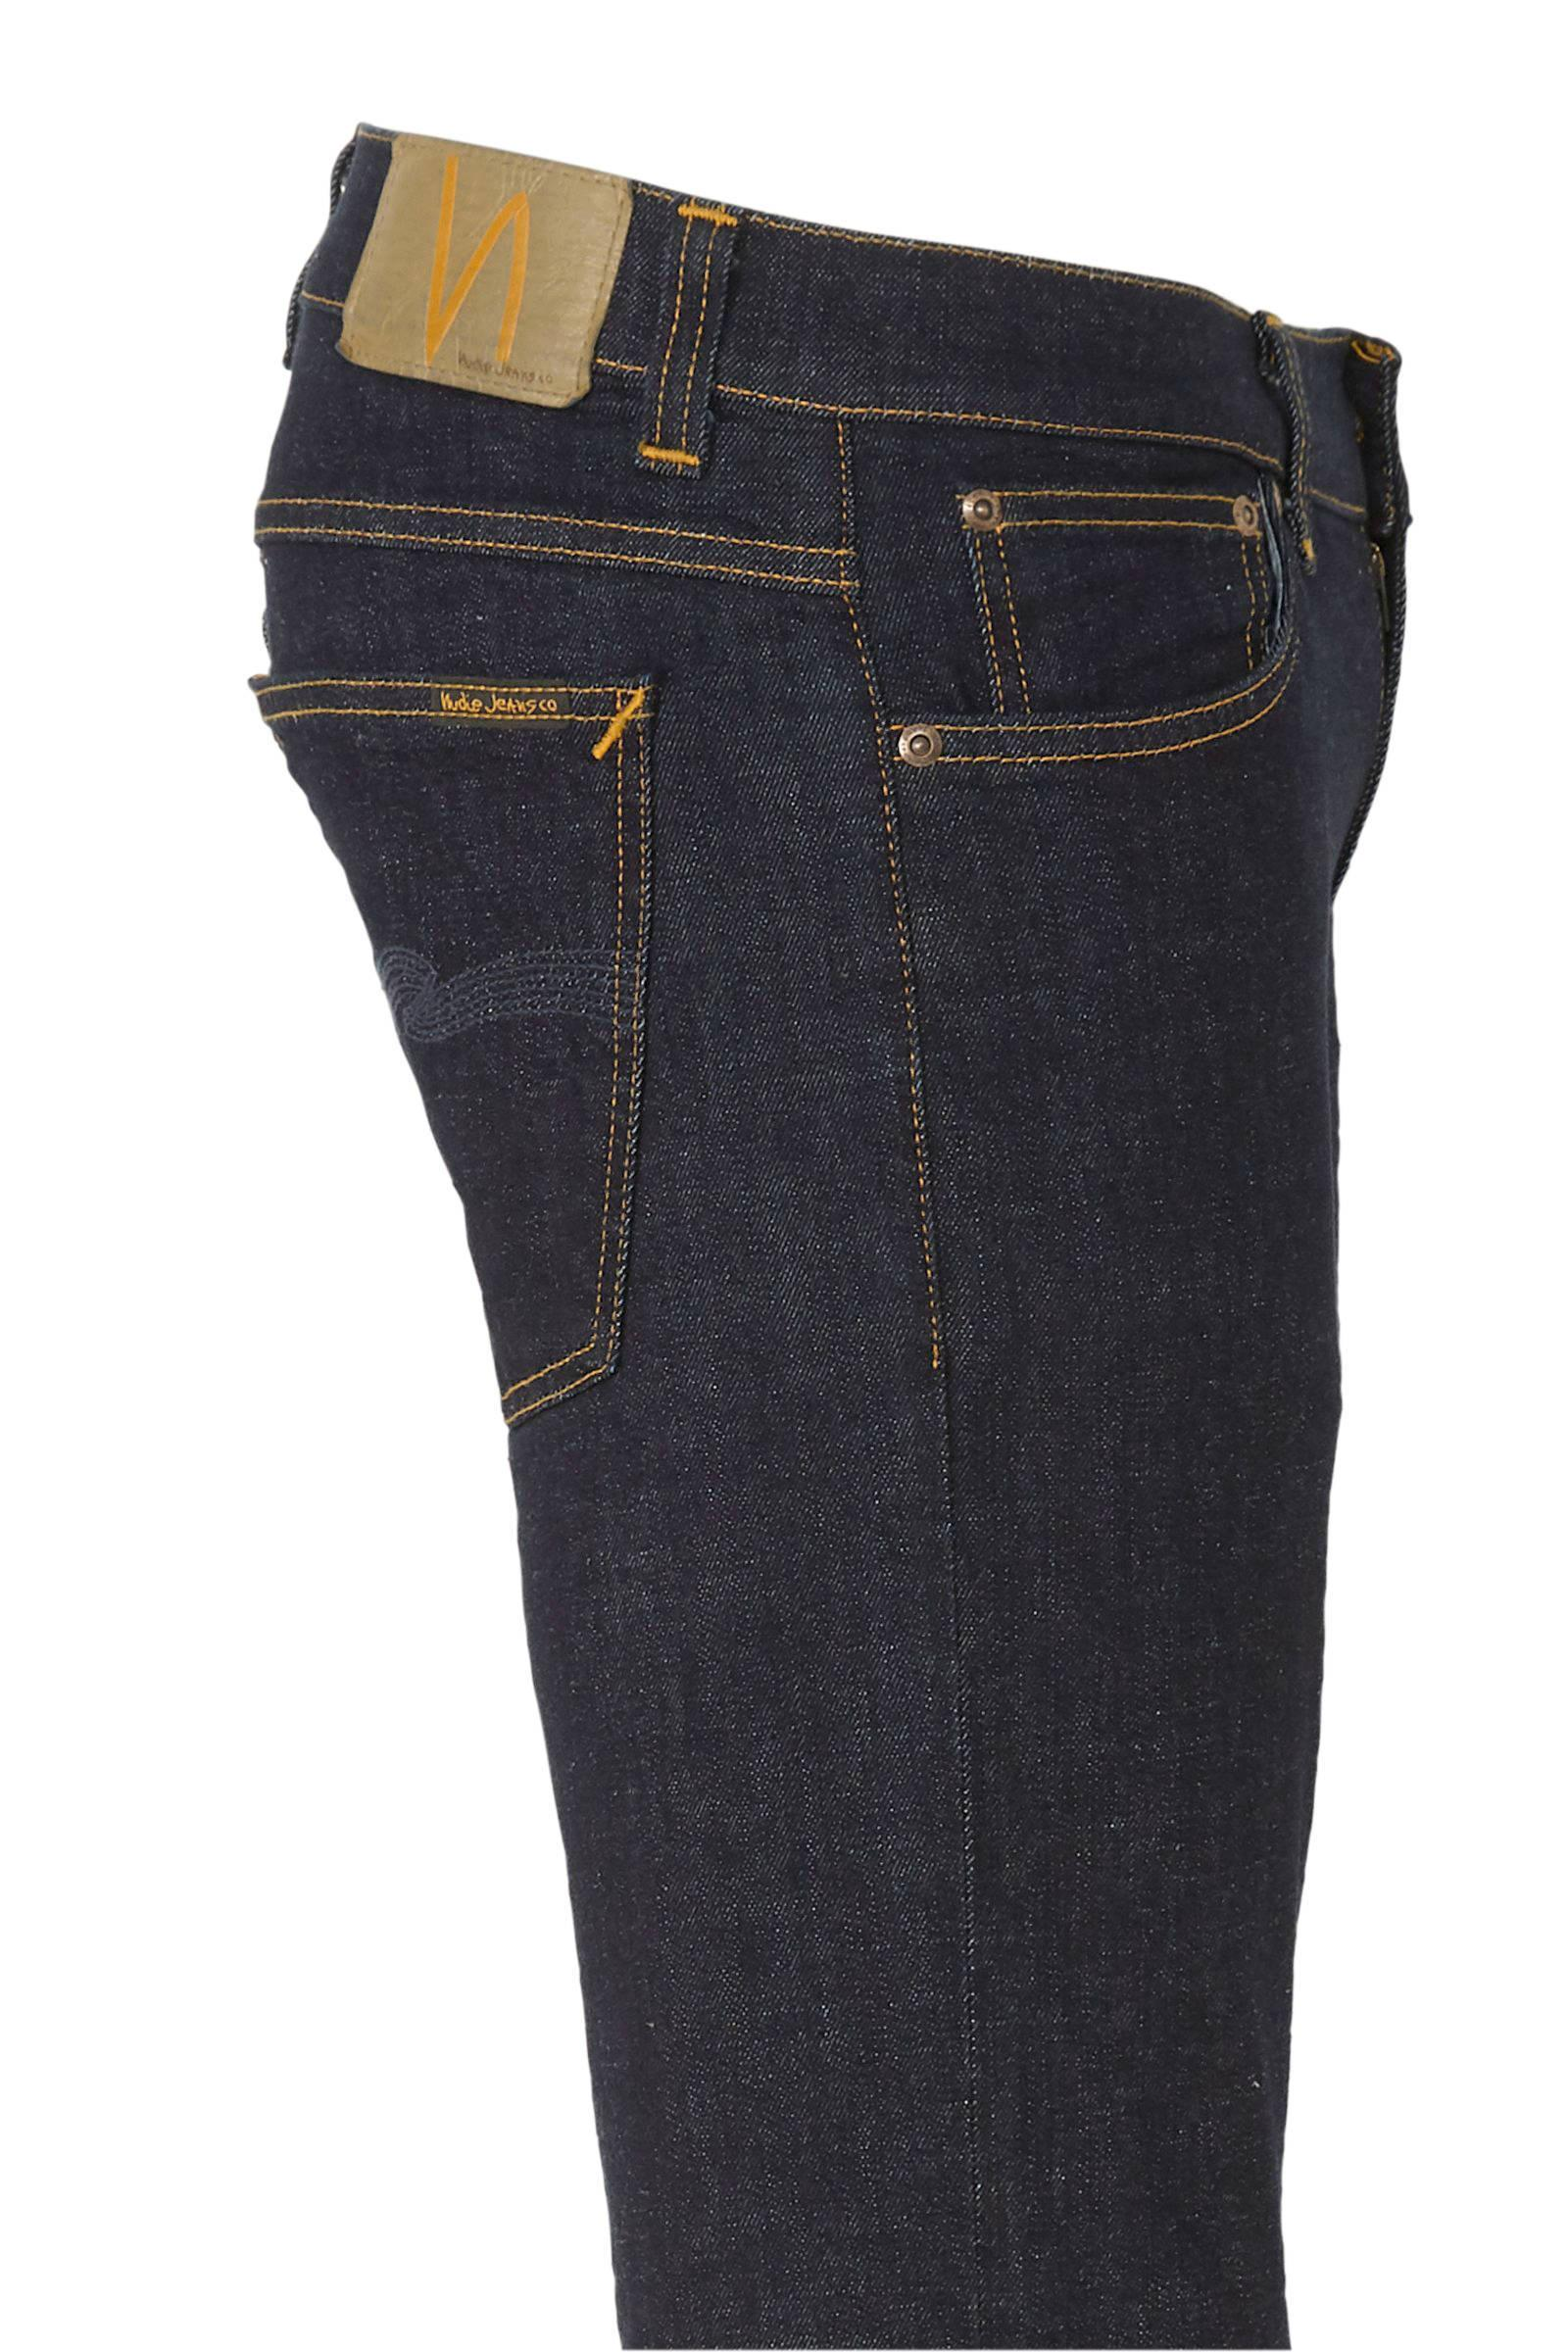 Nudie Jeans Denim Slim Fit Jeans Tight Terry Rinse Twill in het Blauw voor heren